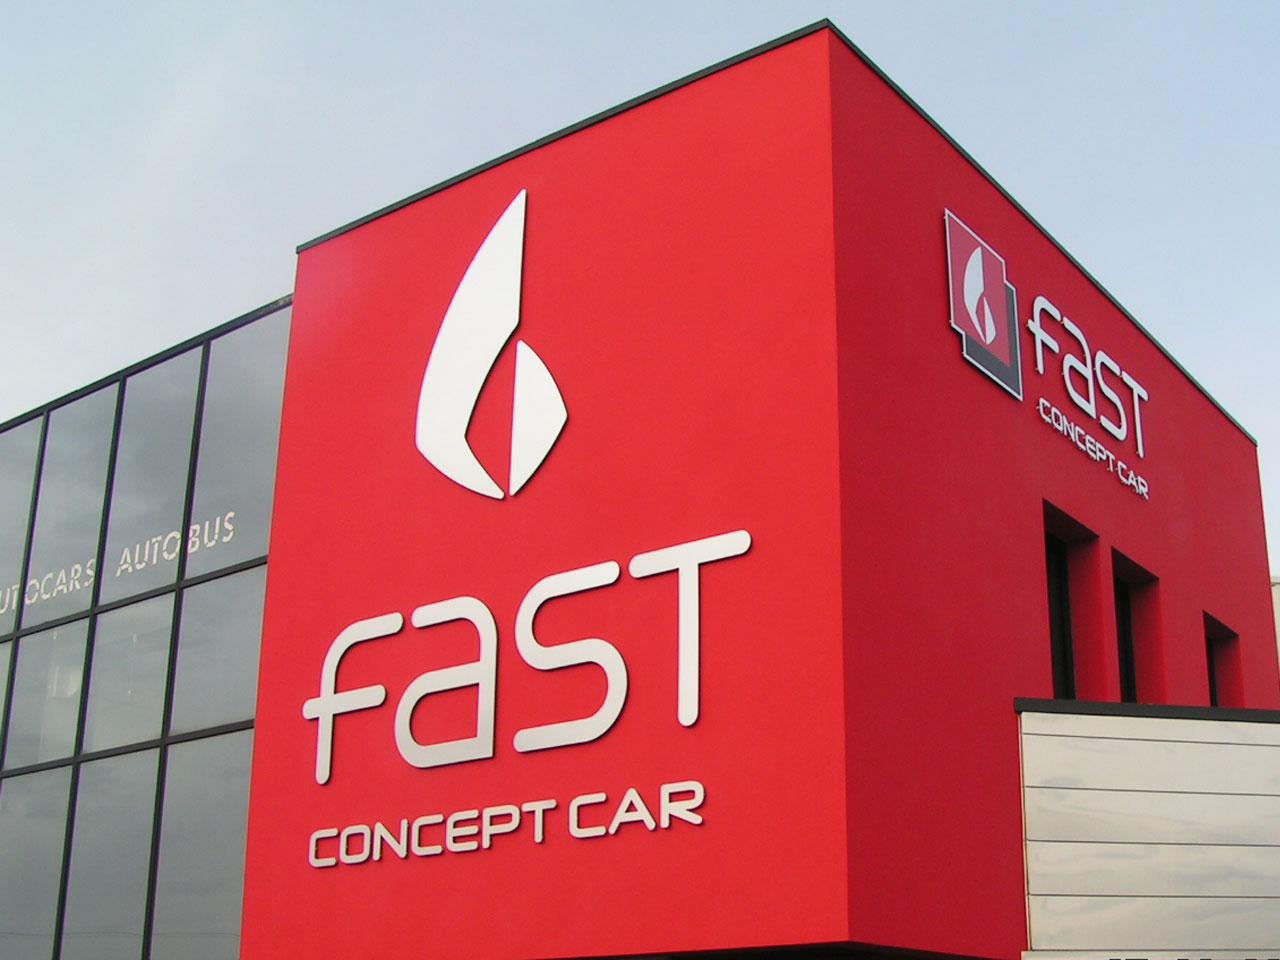 enseigne fast concept car